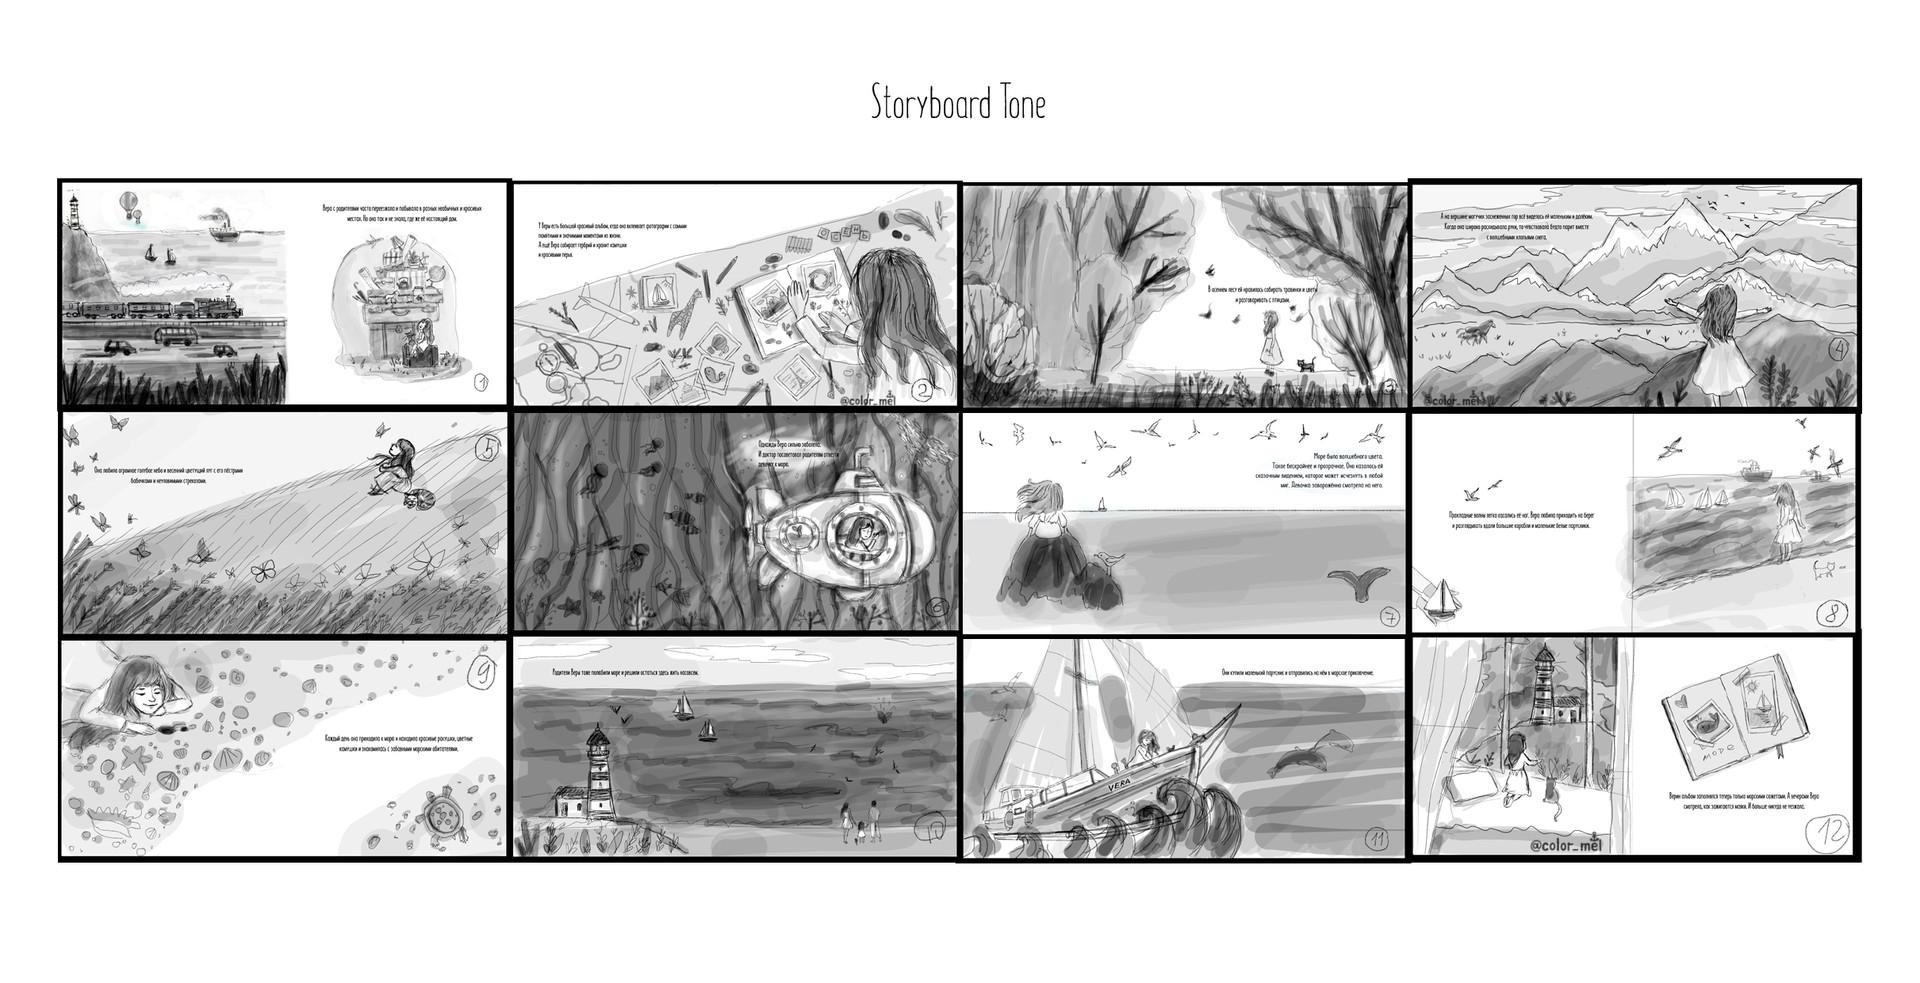 storyboard tone behance .jpg